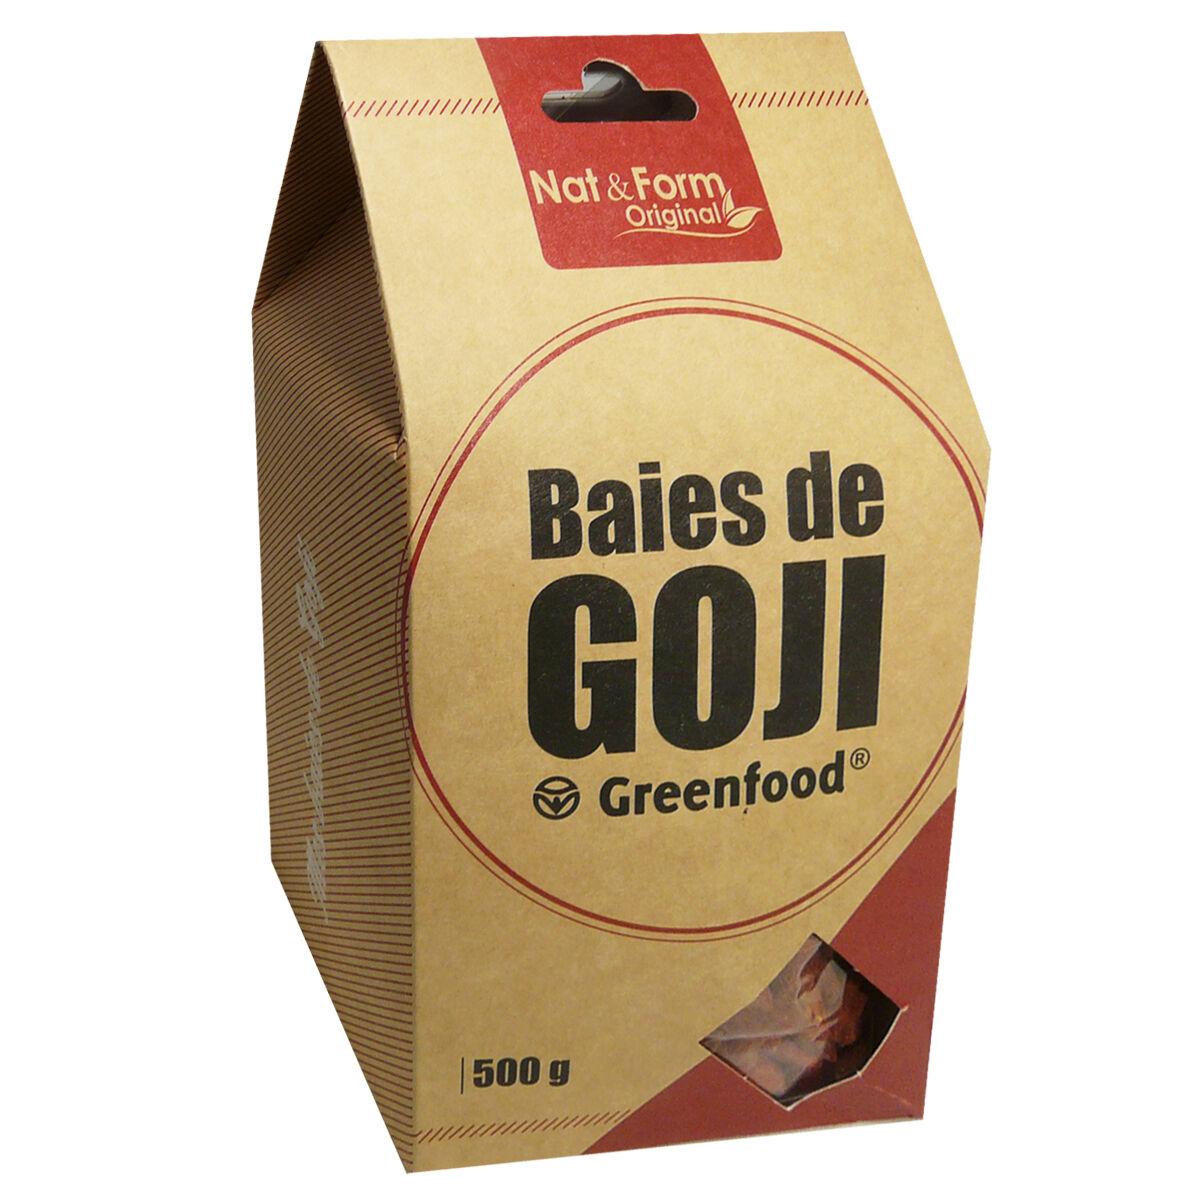 Nat & form baies de goji greenfood 500 g